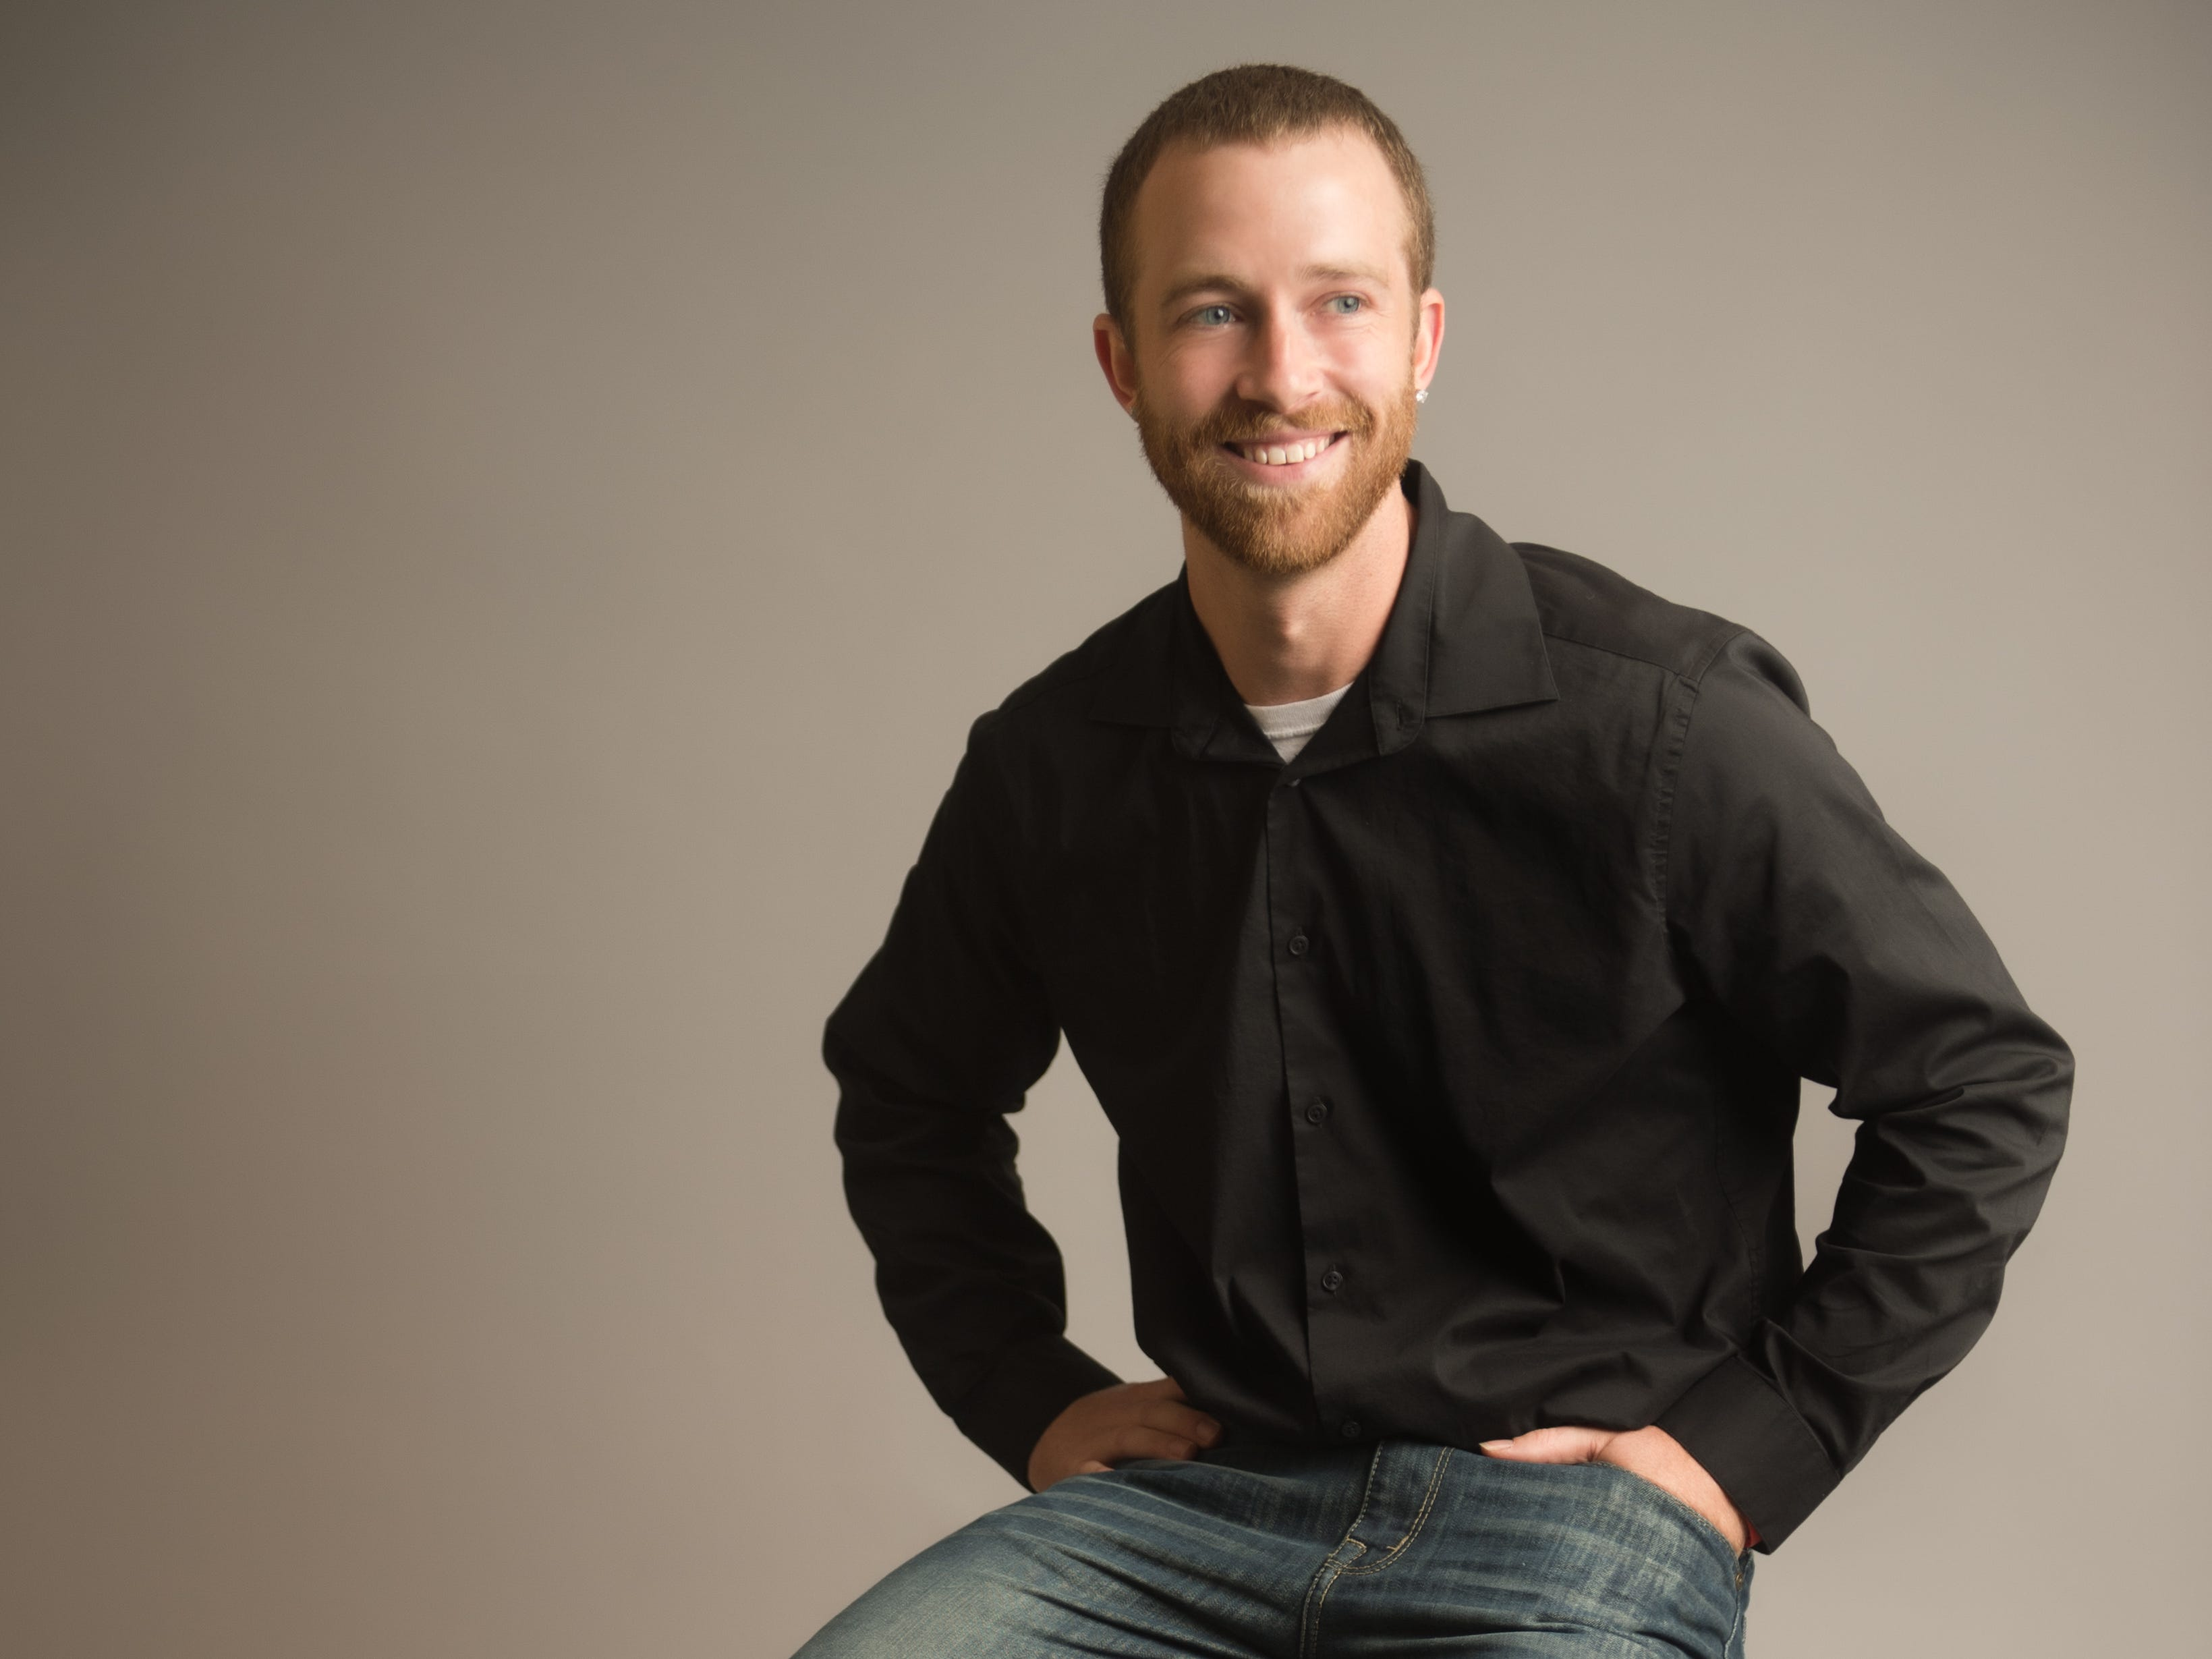 Chase Hamlin, 28 Owner, 9Round Fitness